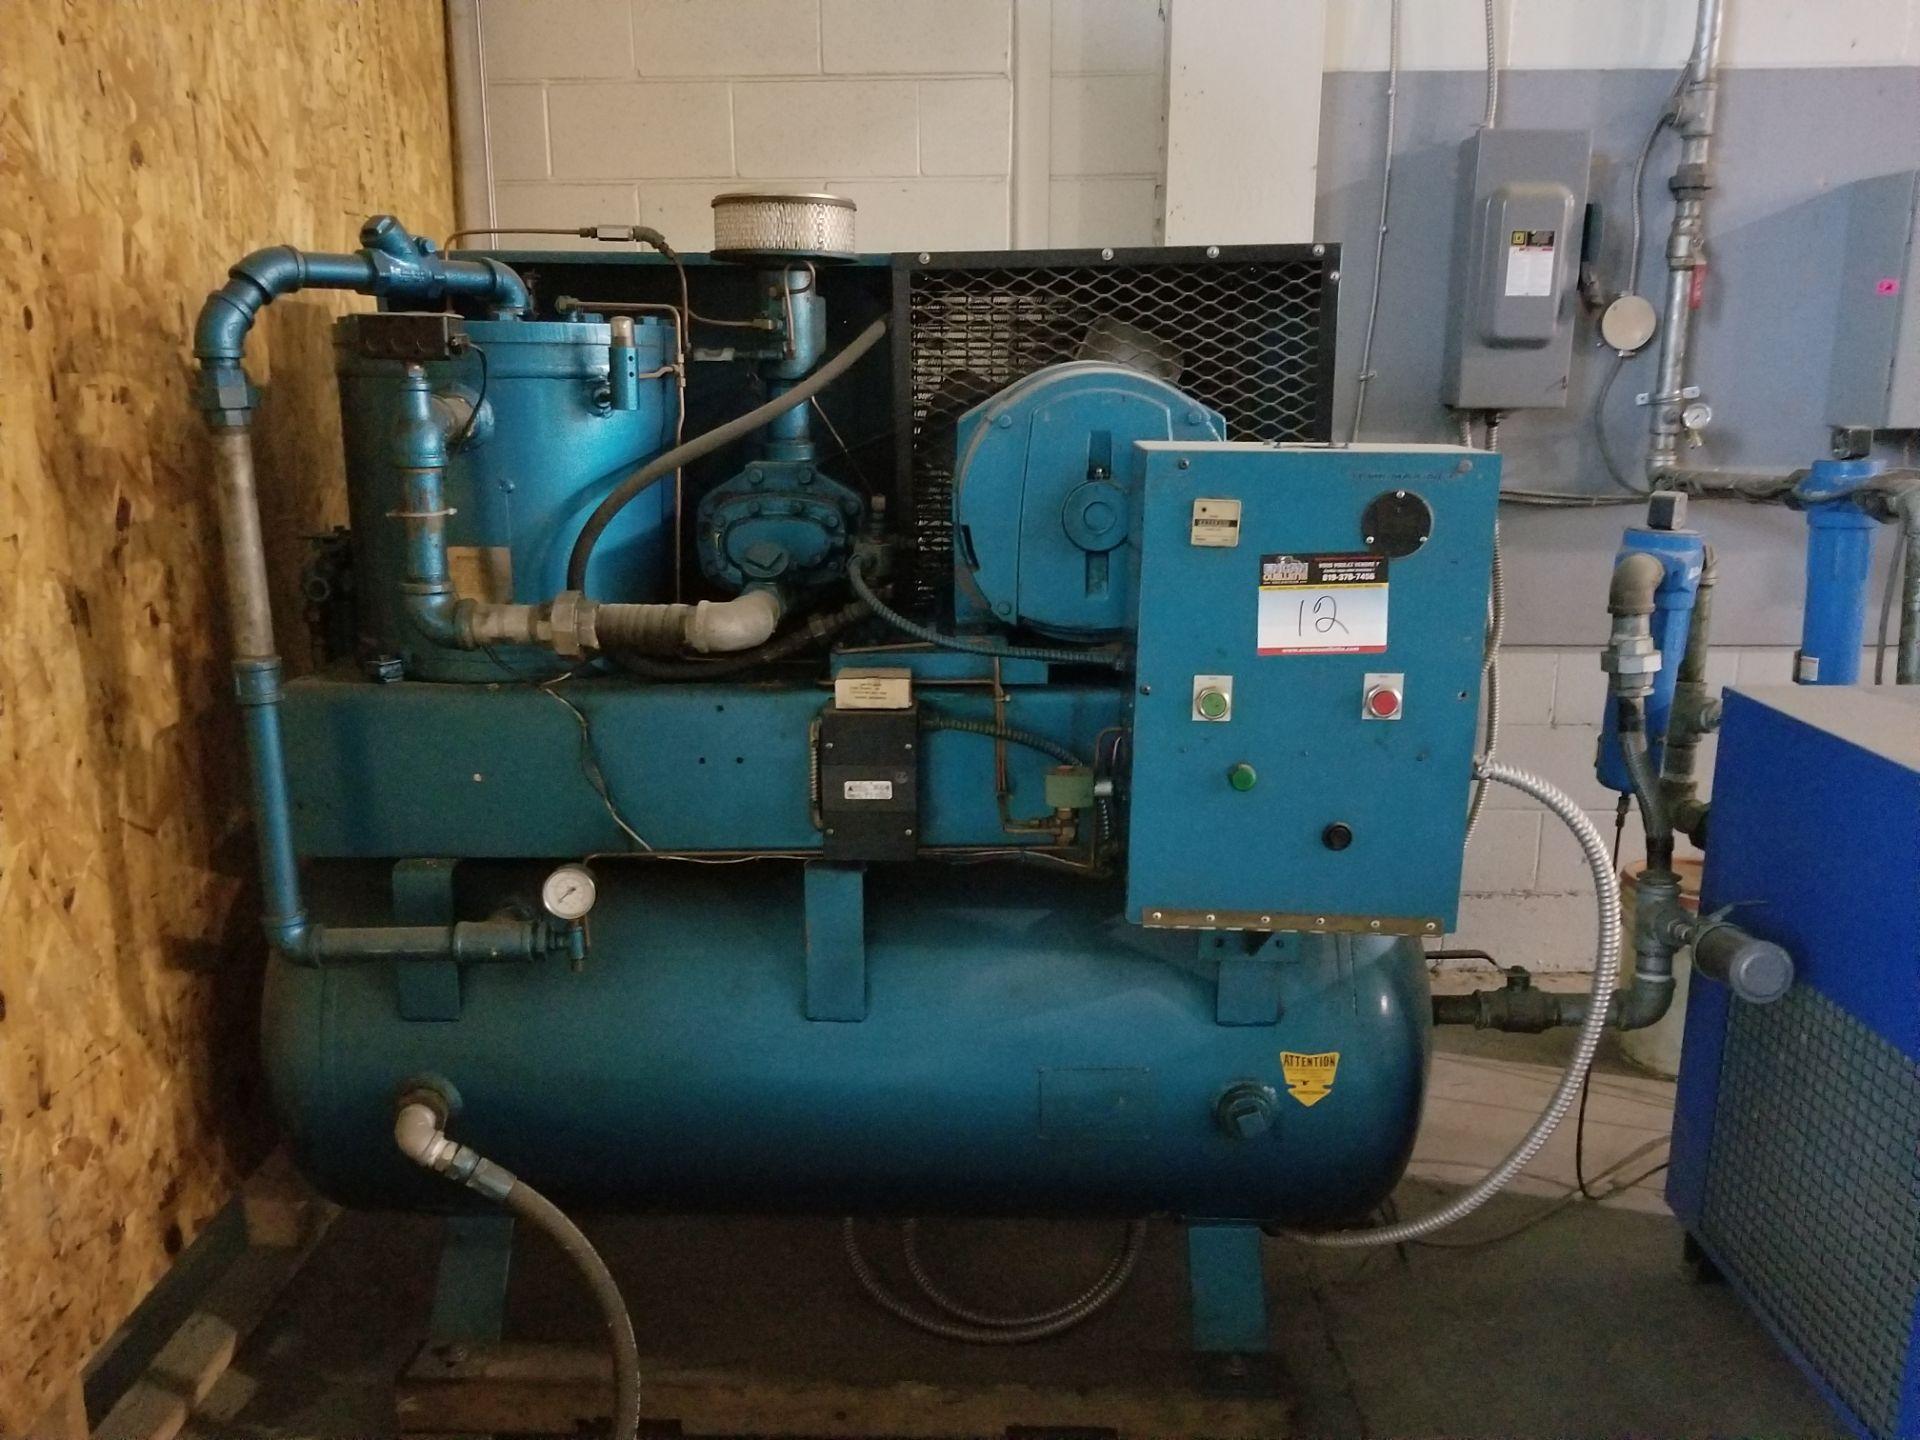 575 volt compressor, dryer, cooler / Compresseur 575 volts, assécheur